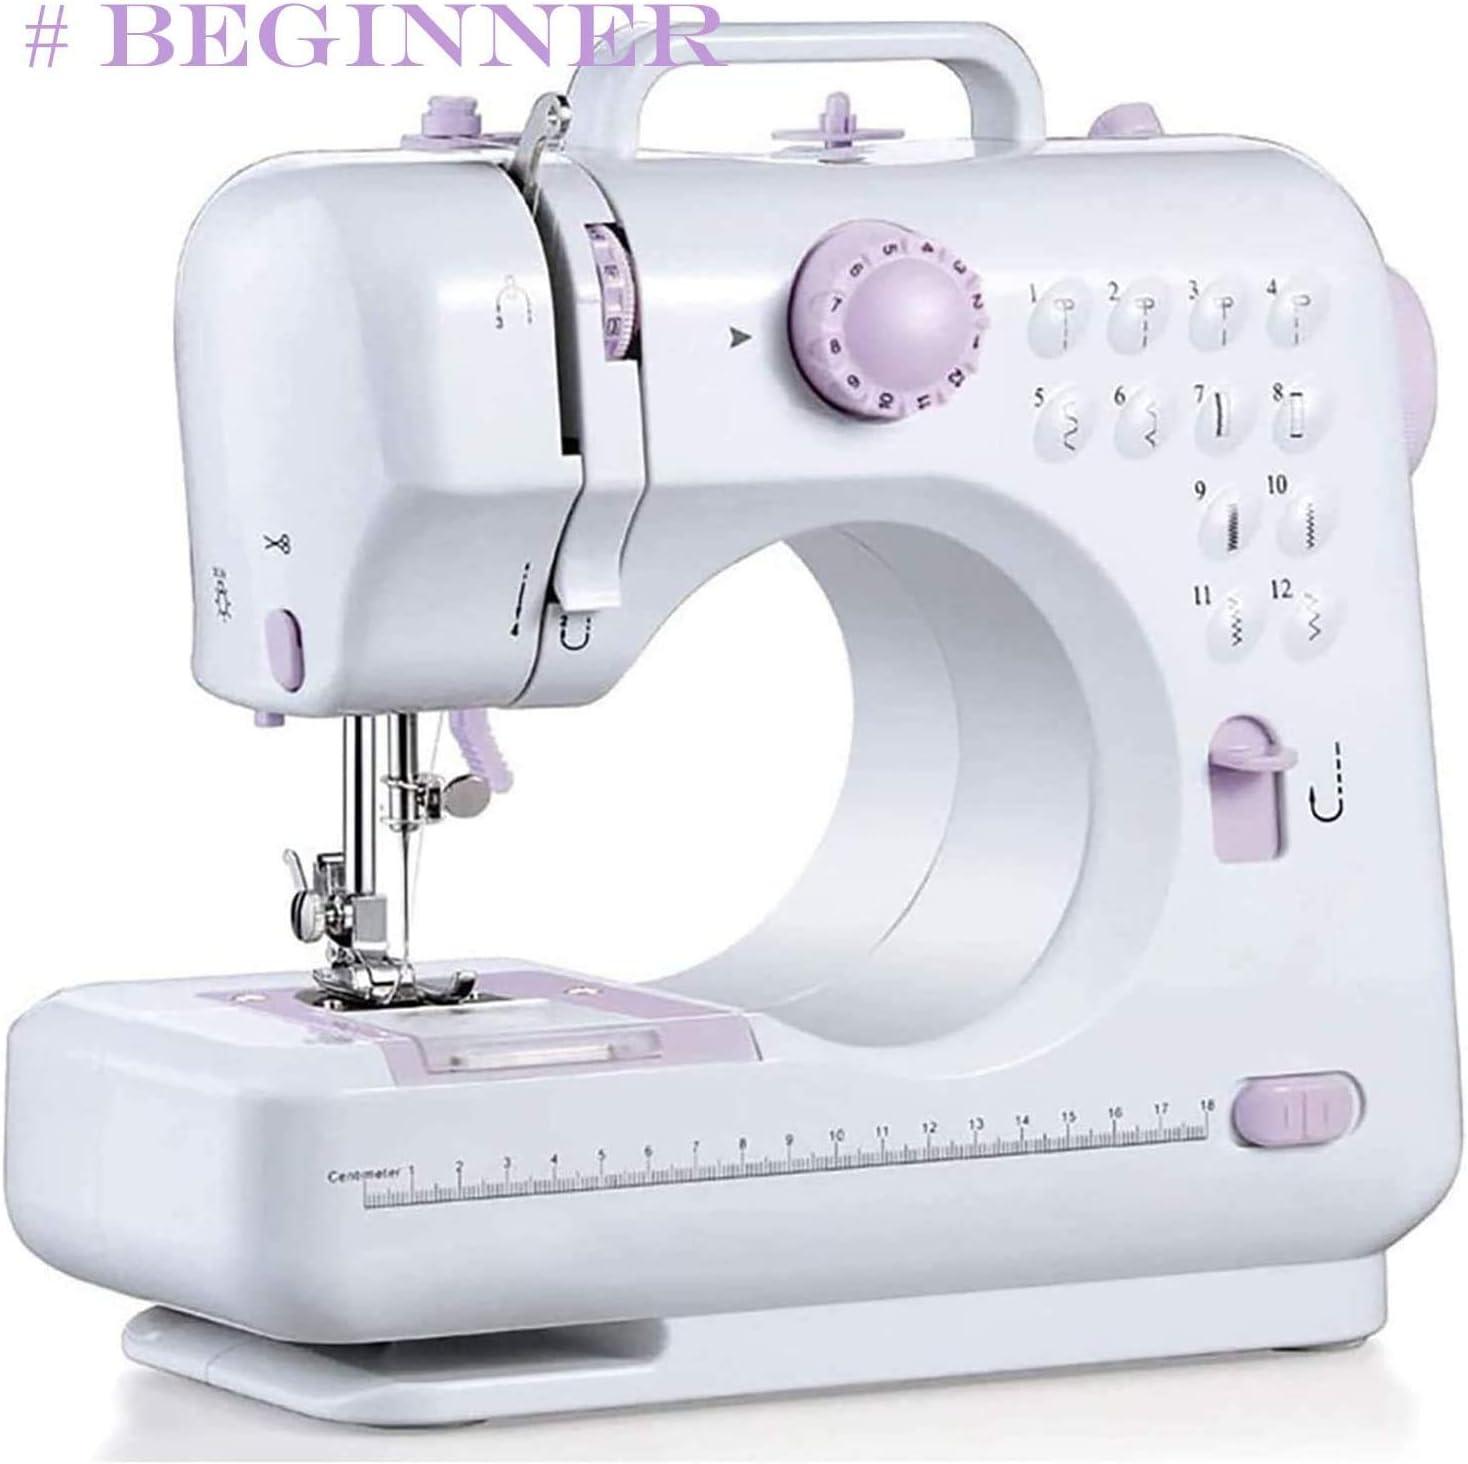 Beginner Electric Overlock Sewing Machine